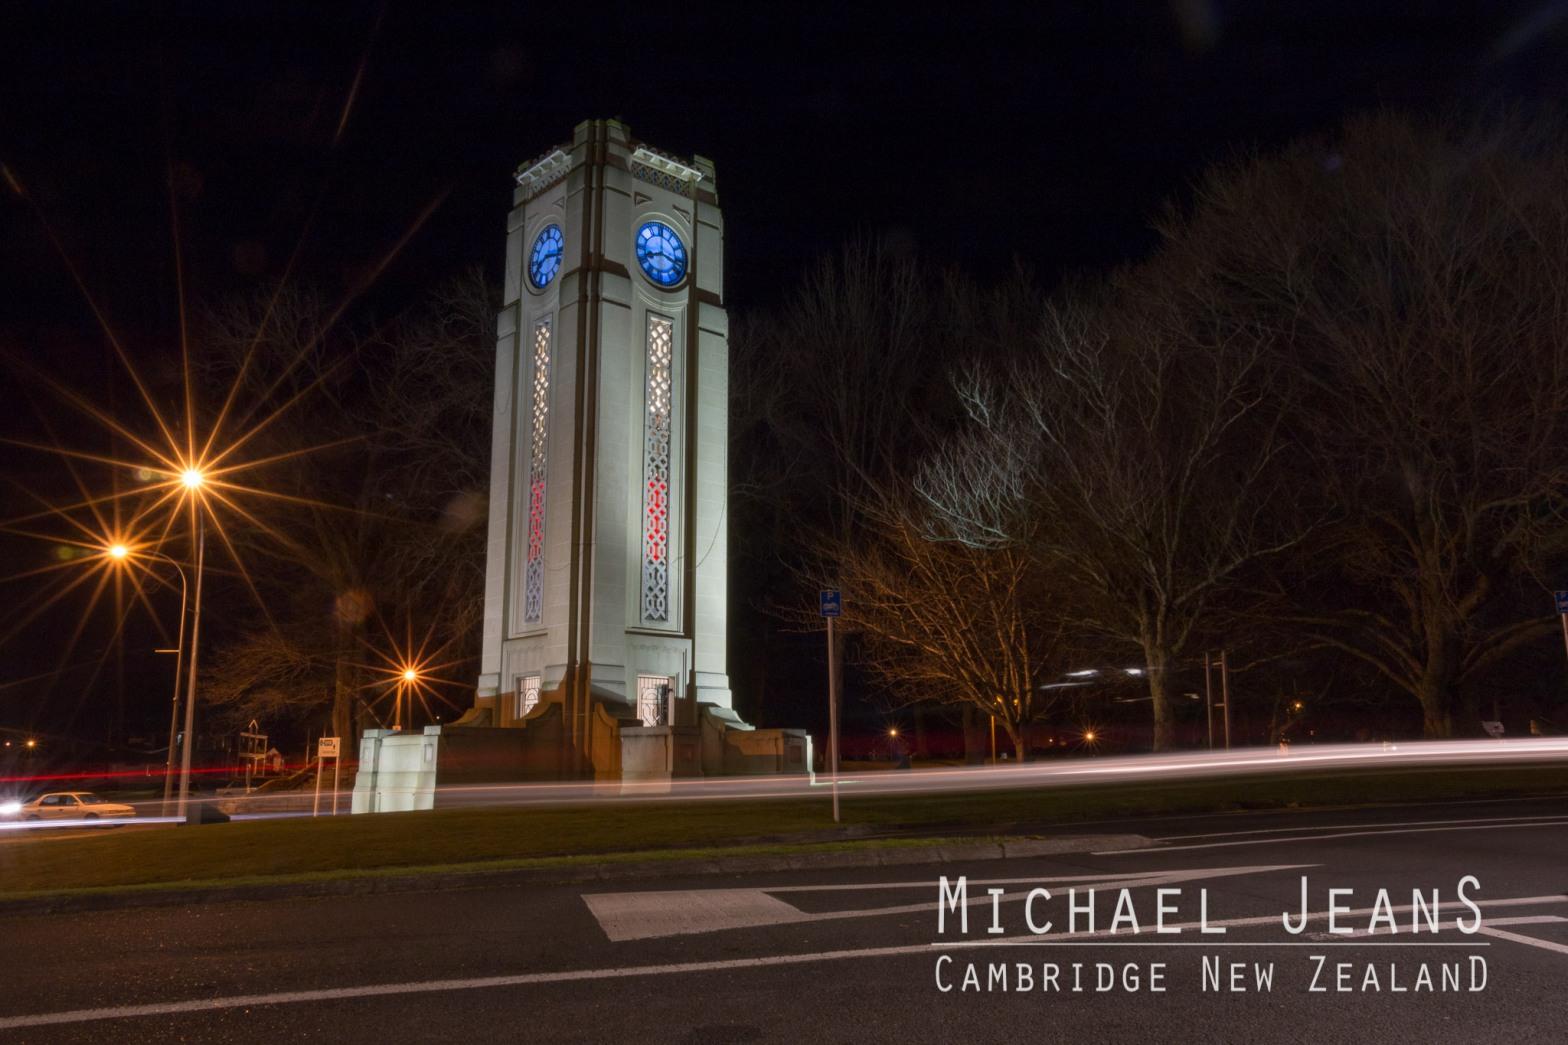 Clock Cambridge New Zealand